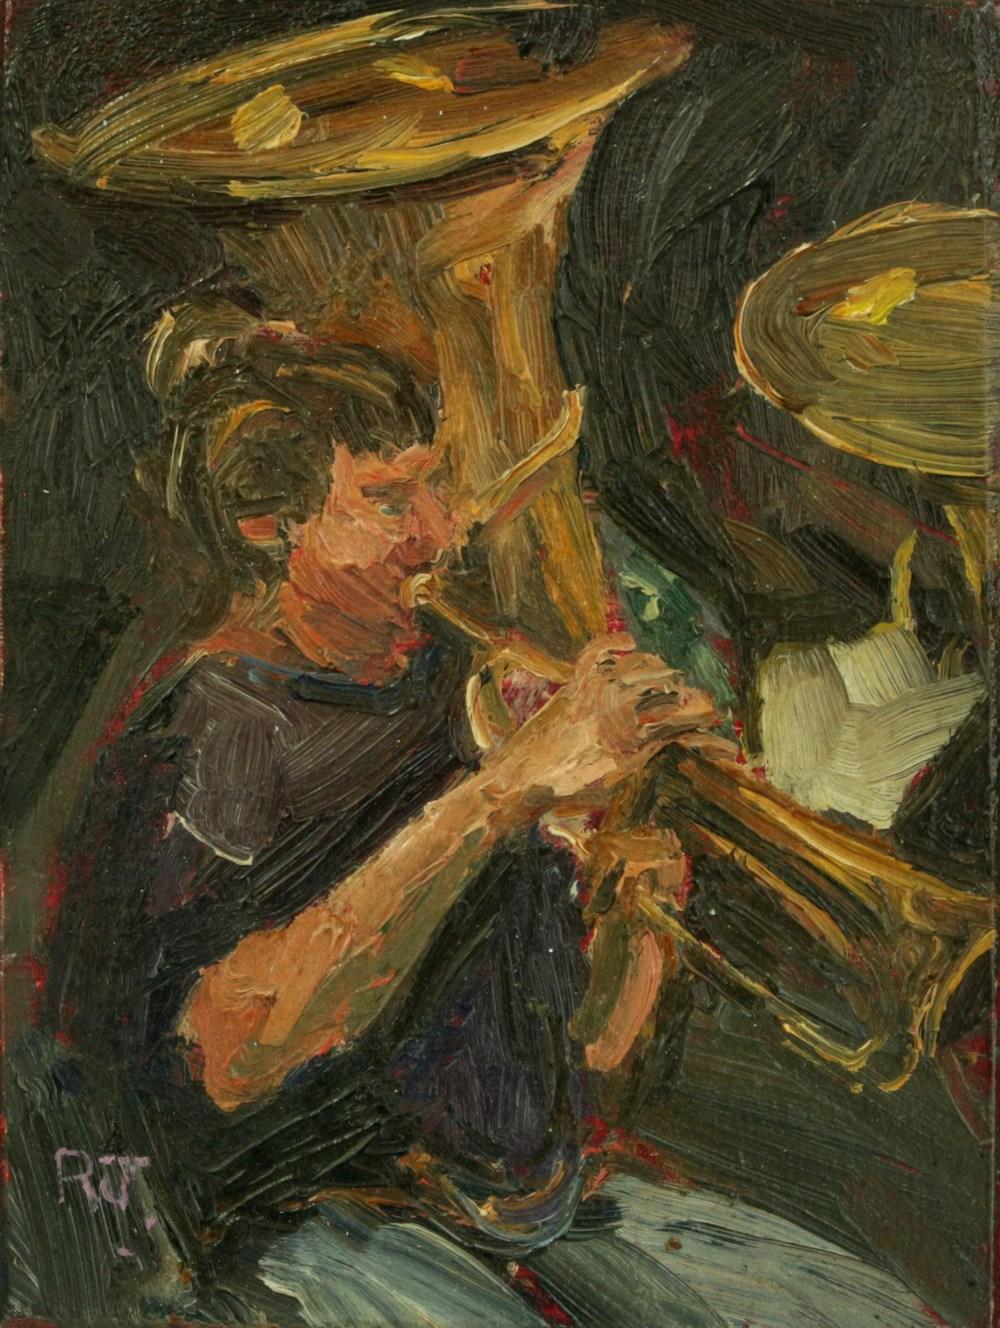 103. brass band II